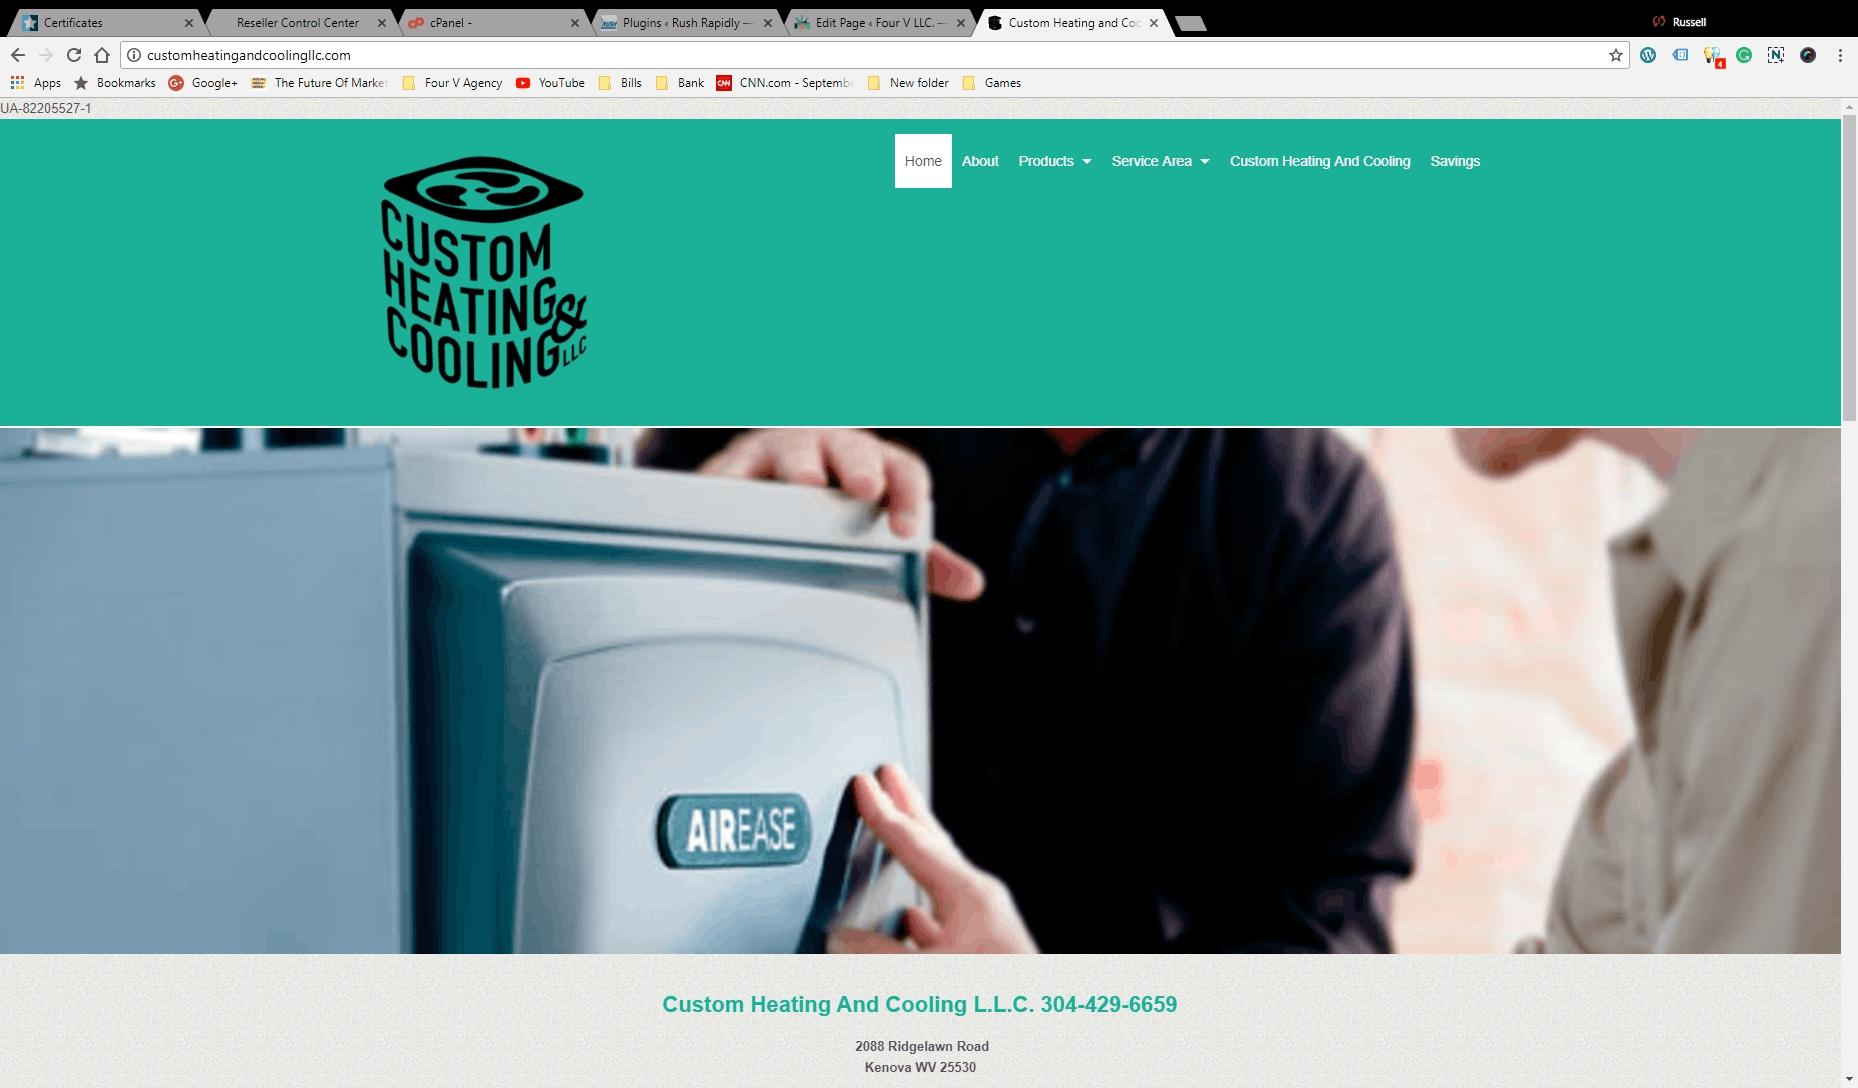 custom heating and cooling llc, Four V LLC, Webdesign